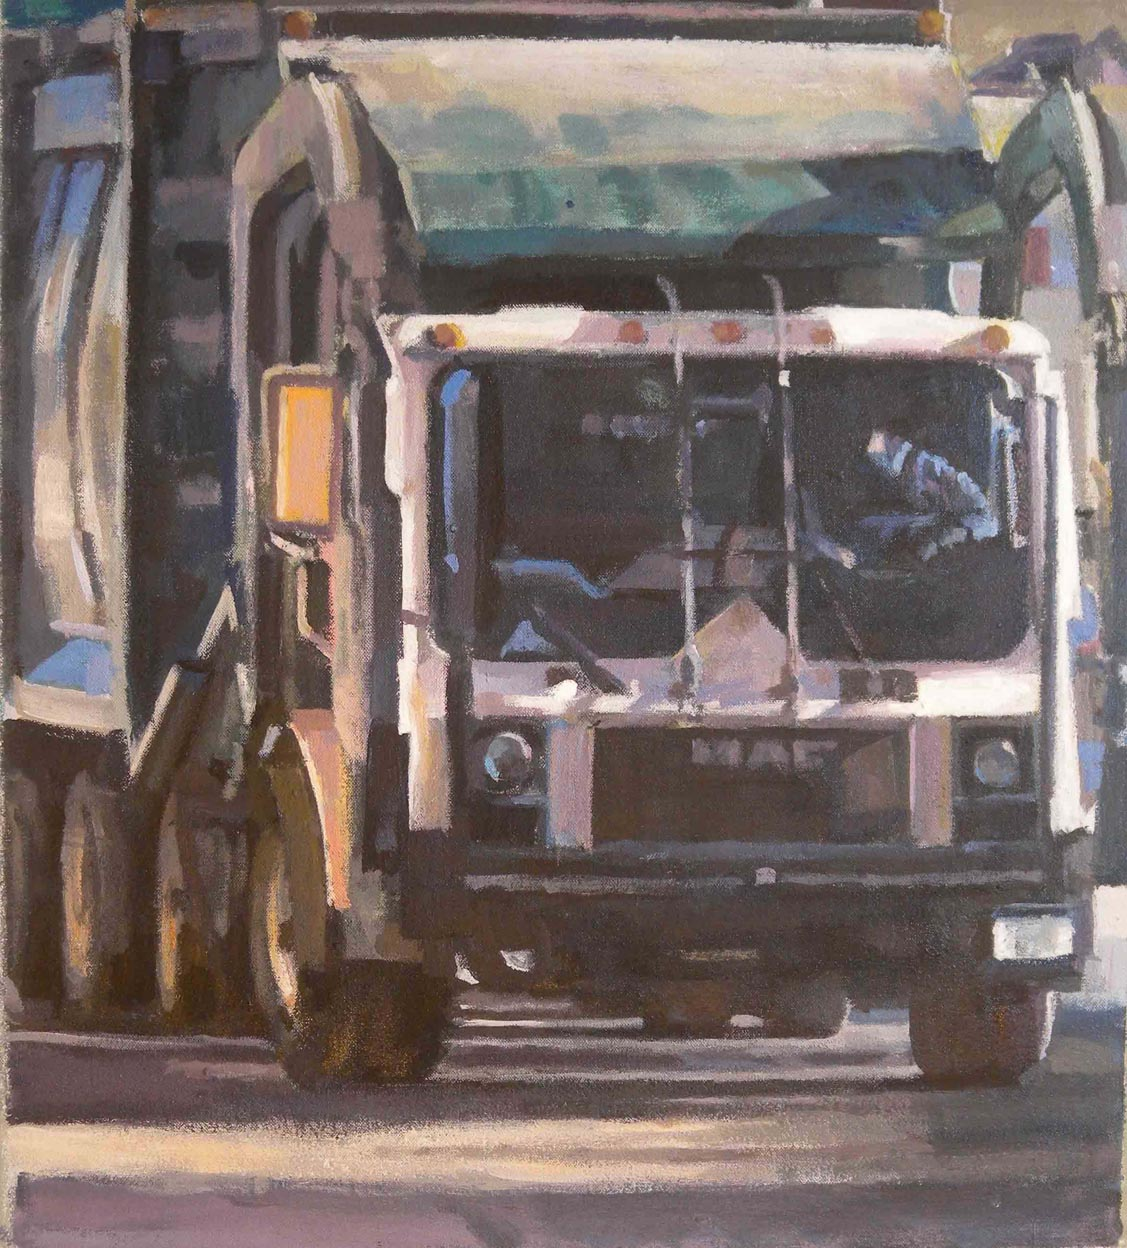 "Green Trash Truck Driver,acrylic on canvas,20 1/2"" x 18 1/4"""